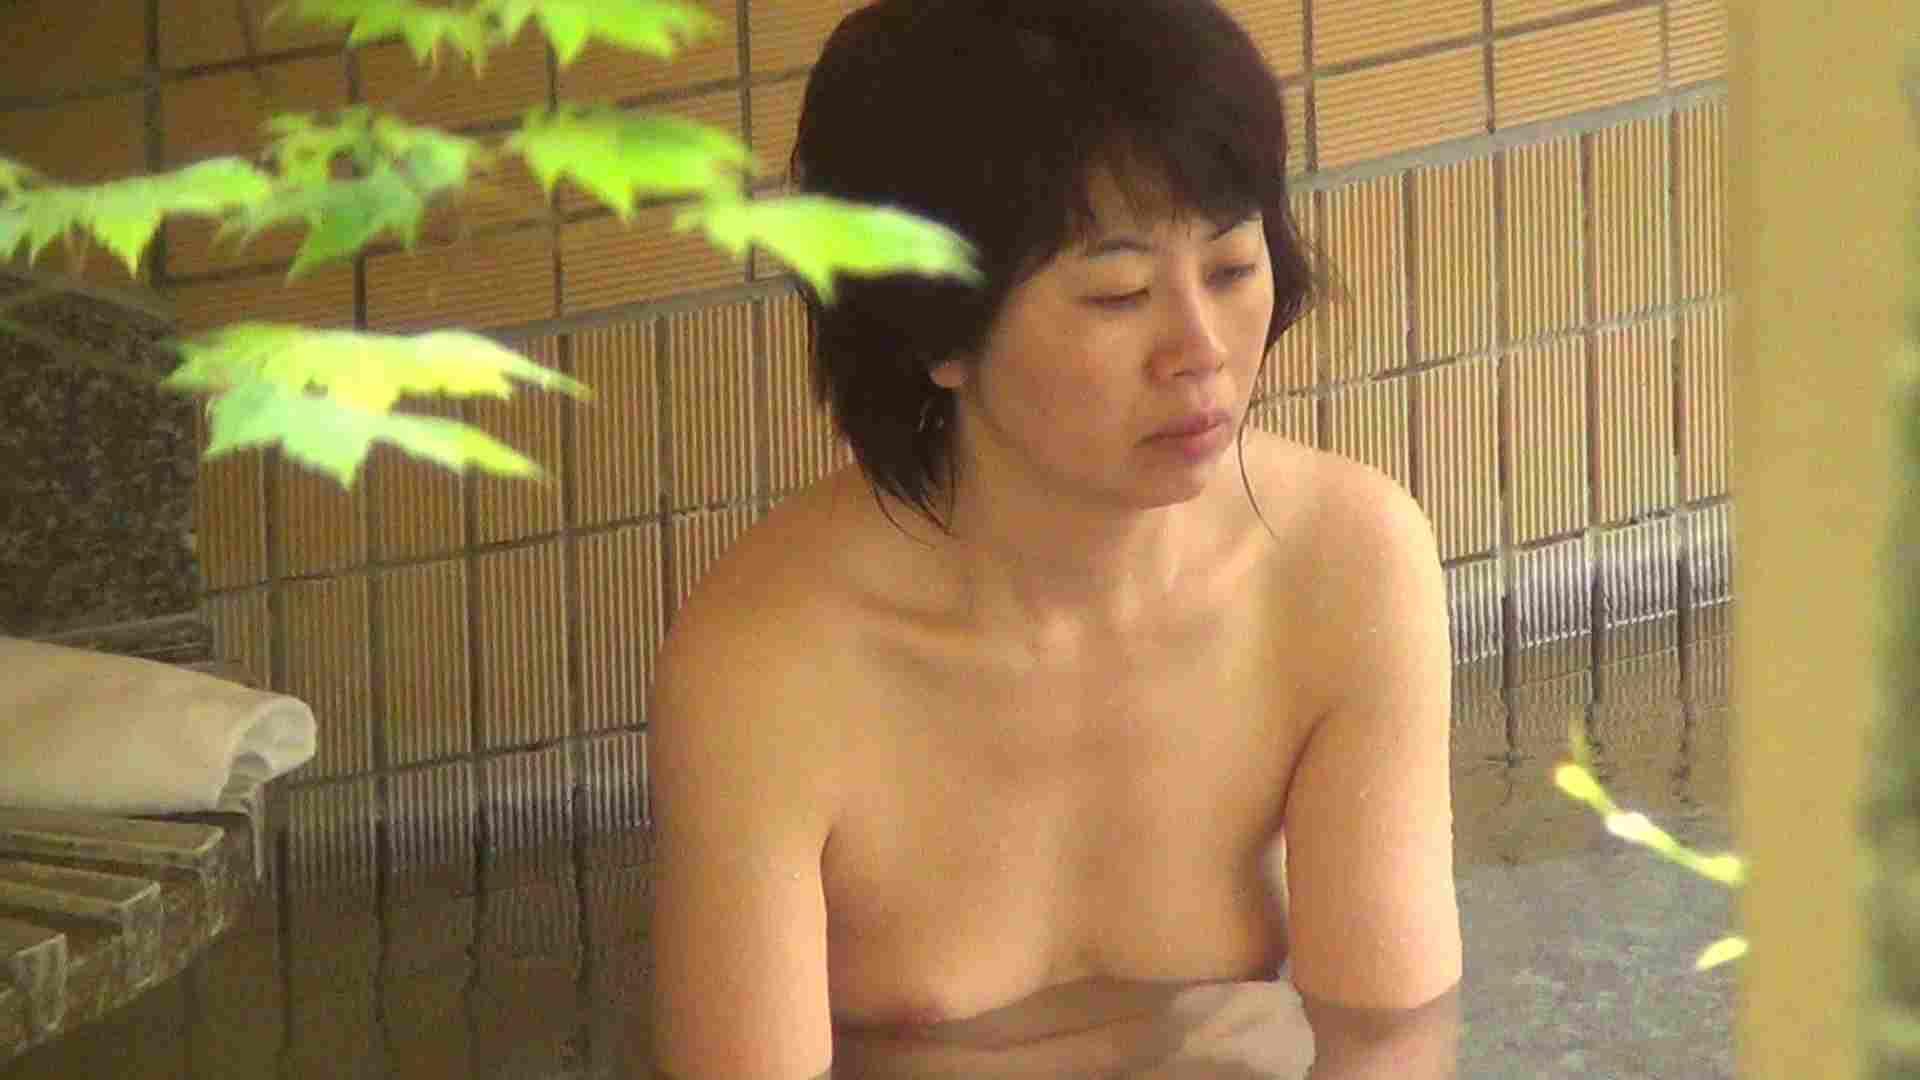 Aquaな露天風呂Vol.247 盗撮  83連発 42